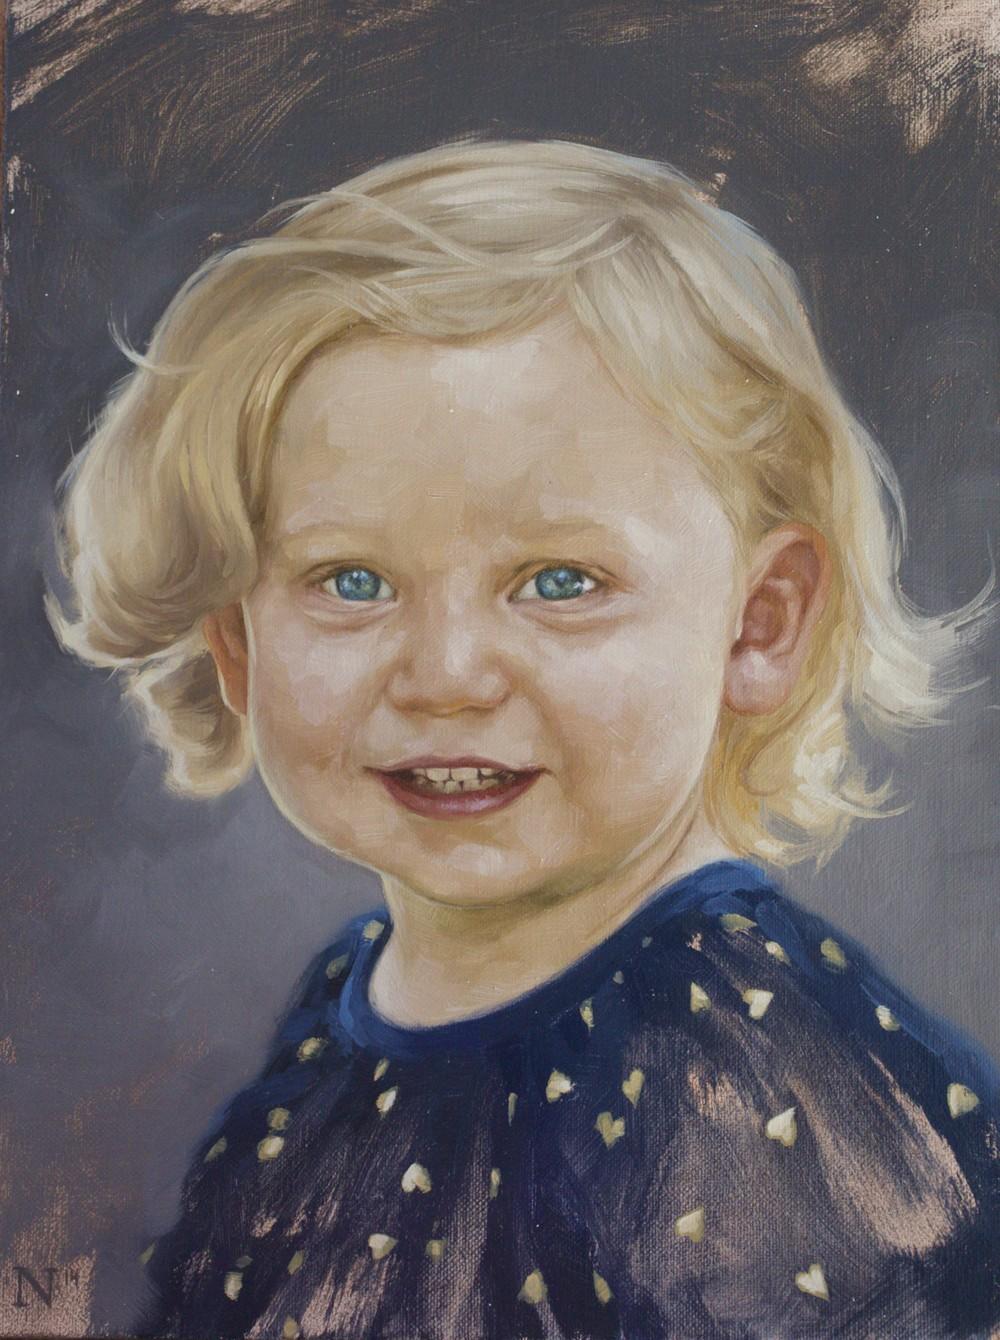 Paley 2yr Portrait by Aaron Nagel